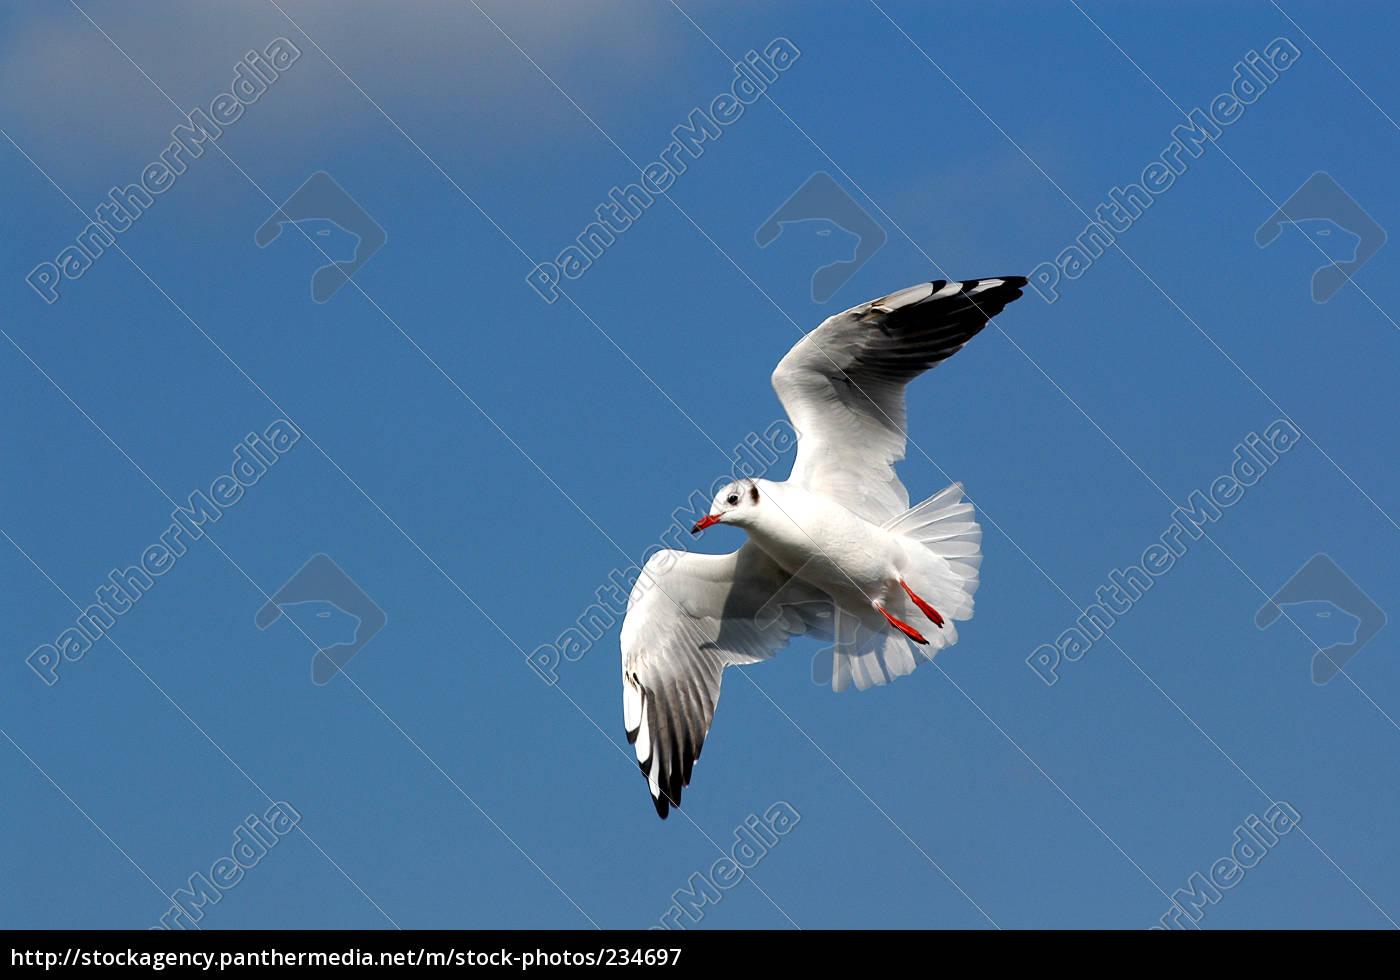 black-headed, gull - 234697